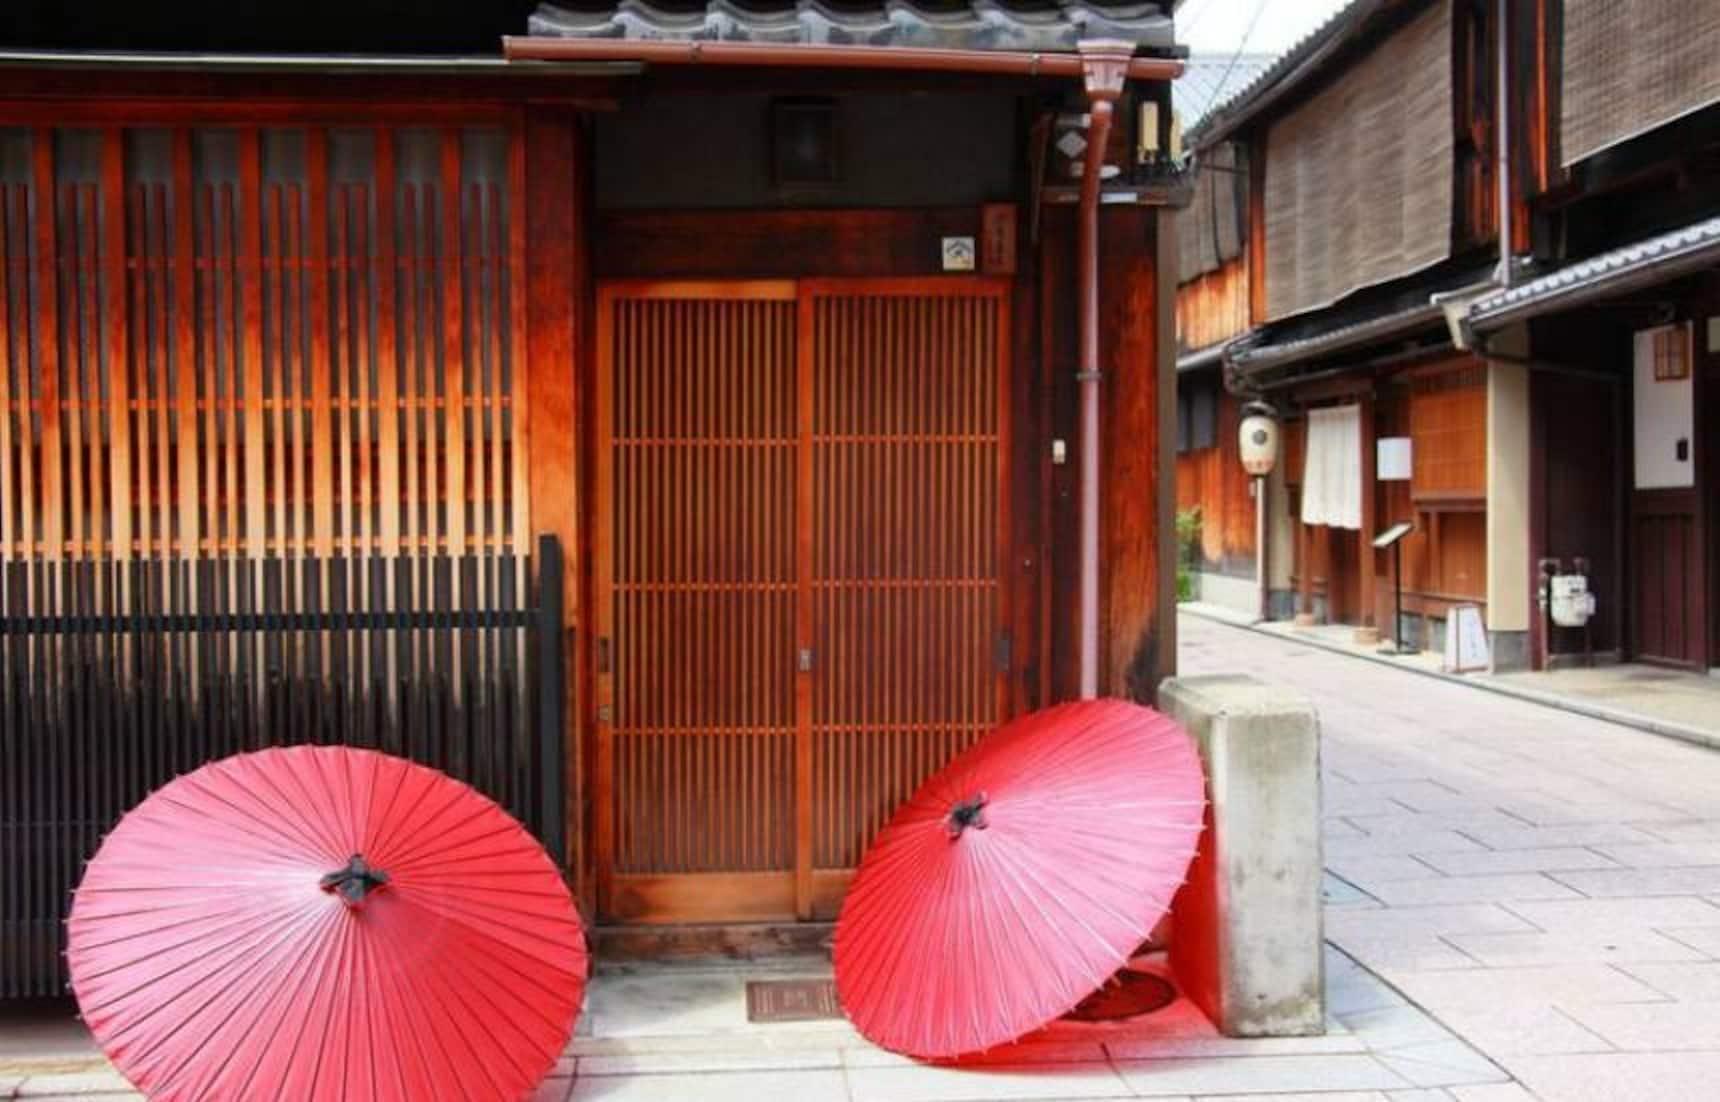 10 Great Spots in Kyoto for Walkers